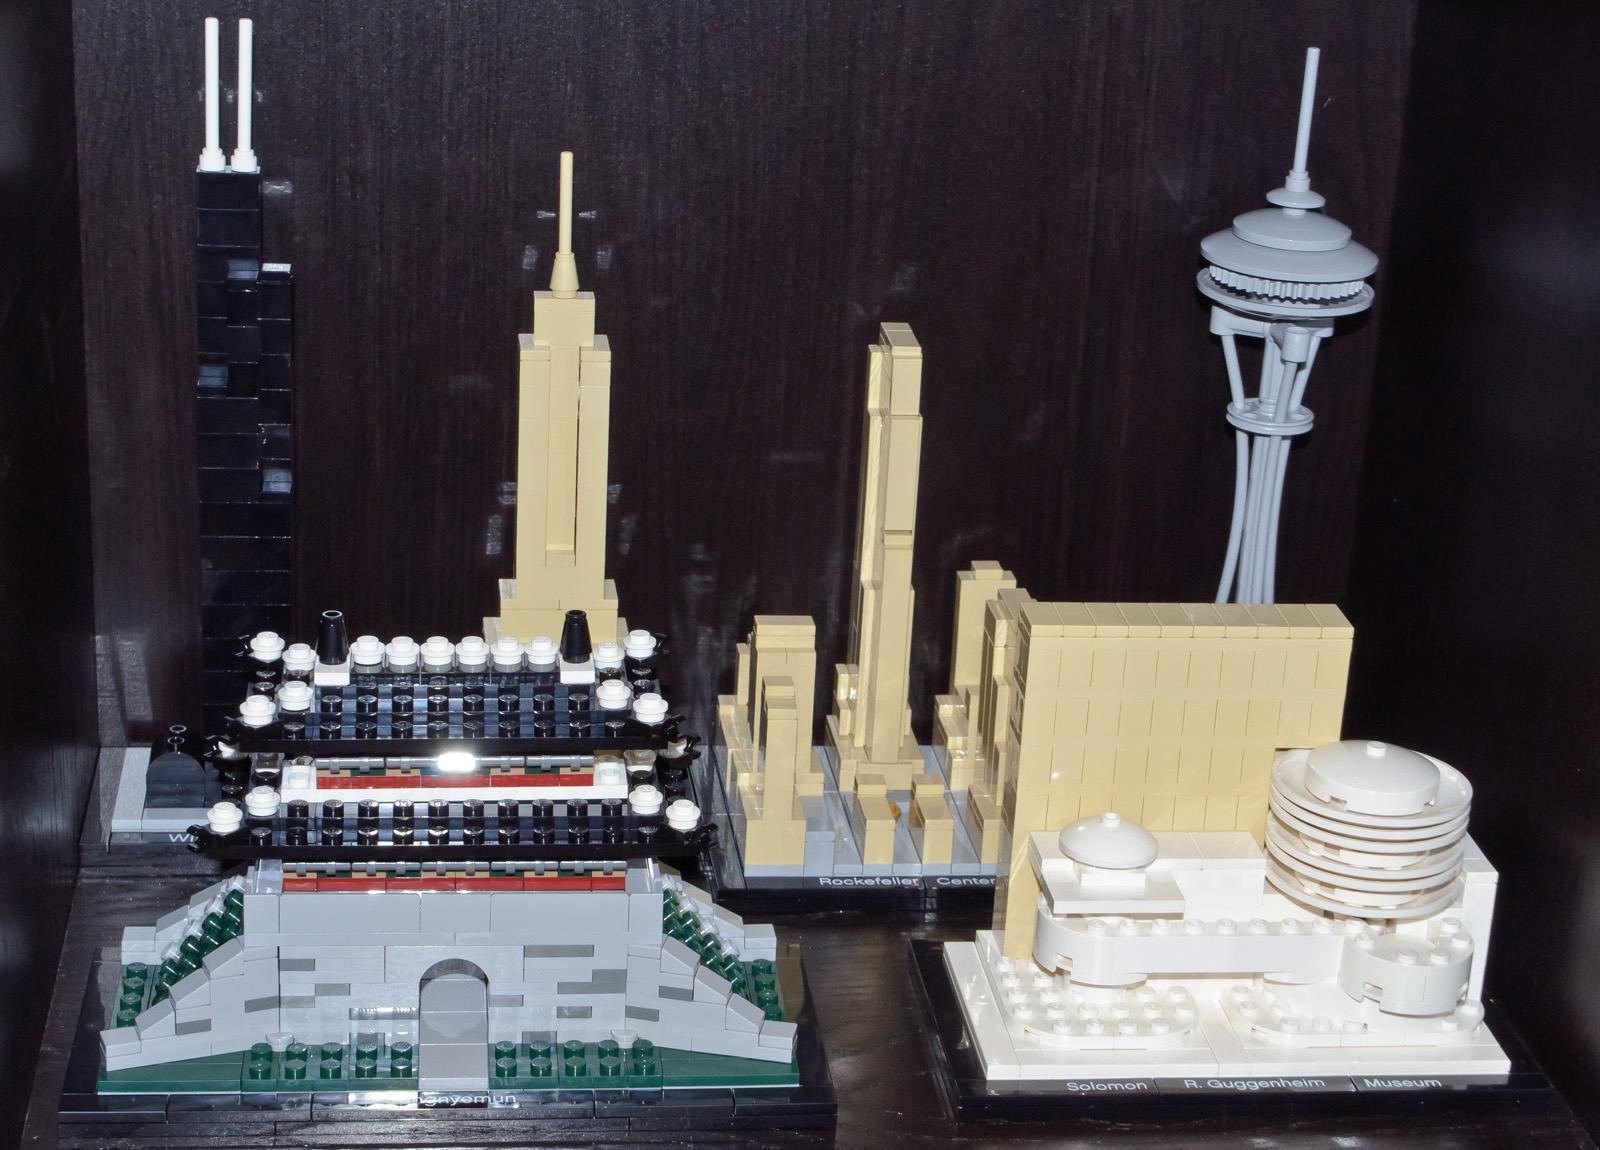 Lego Architecture Sets 21000 21002 21003 21004 21007